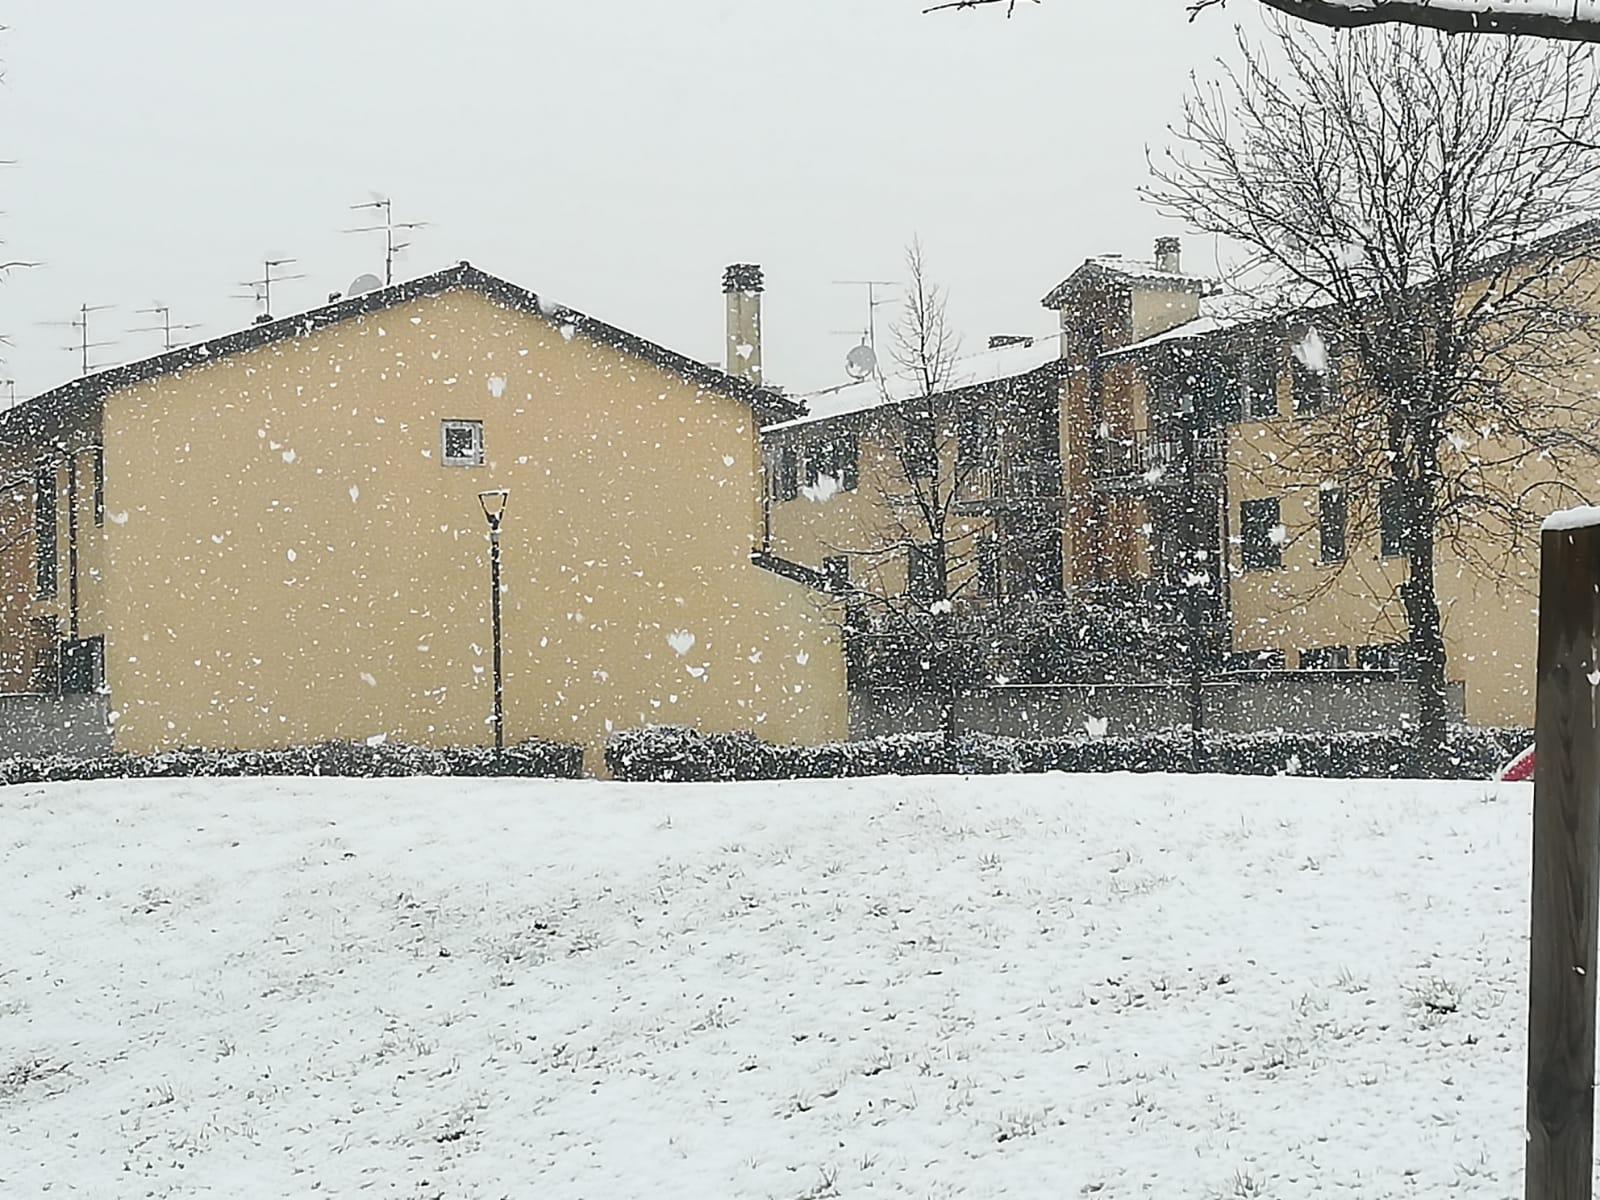 Toscana 25, 26, 27, 28, 29, 30 31 gennaio 2019-aae0dc2c-7b84-4c1b-9e2c-e6c9e58fd43c.jpeg